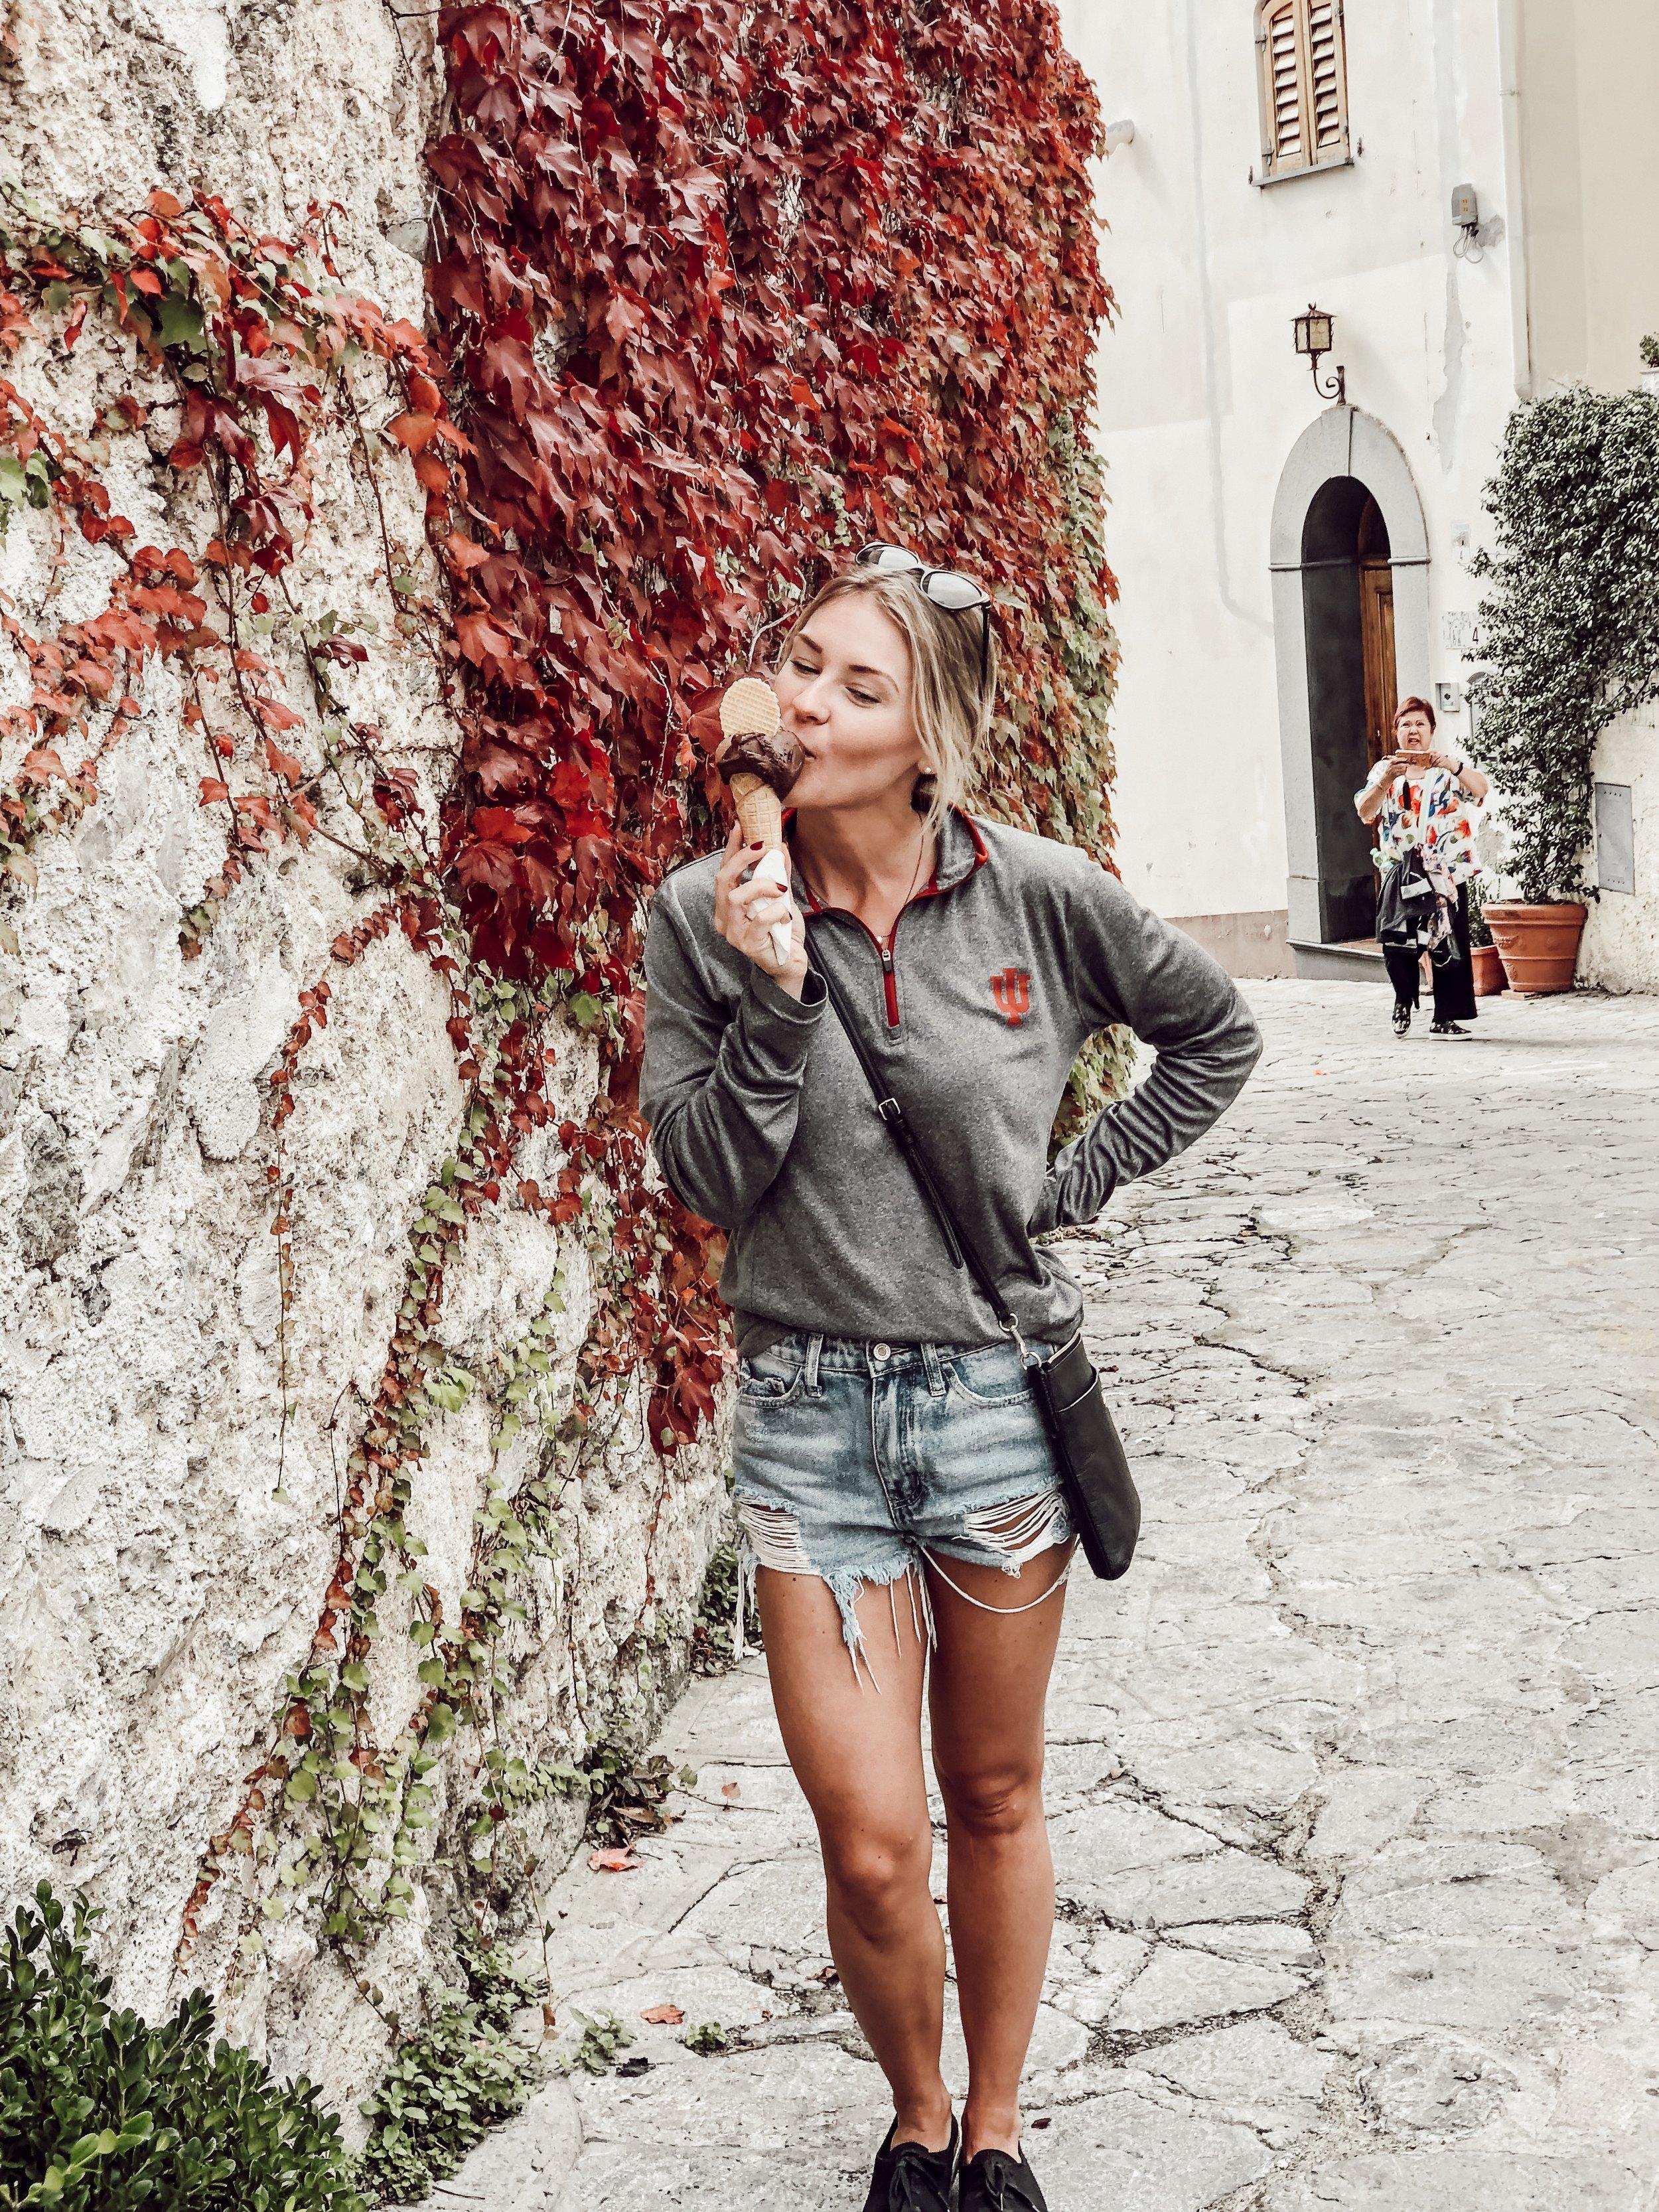 Ravello Gelato | Three Days on the Amalfi Coast, Amalfi Travel Guide, What to Do in Amalfi Italy | Miranda Schroeder Blog